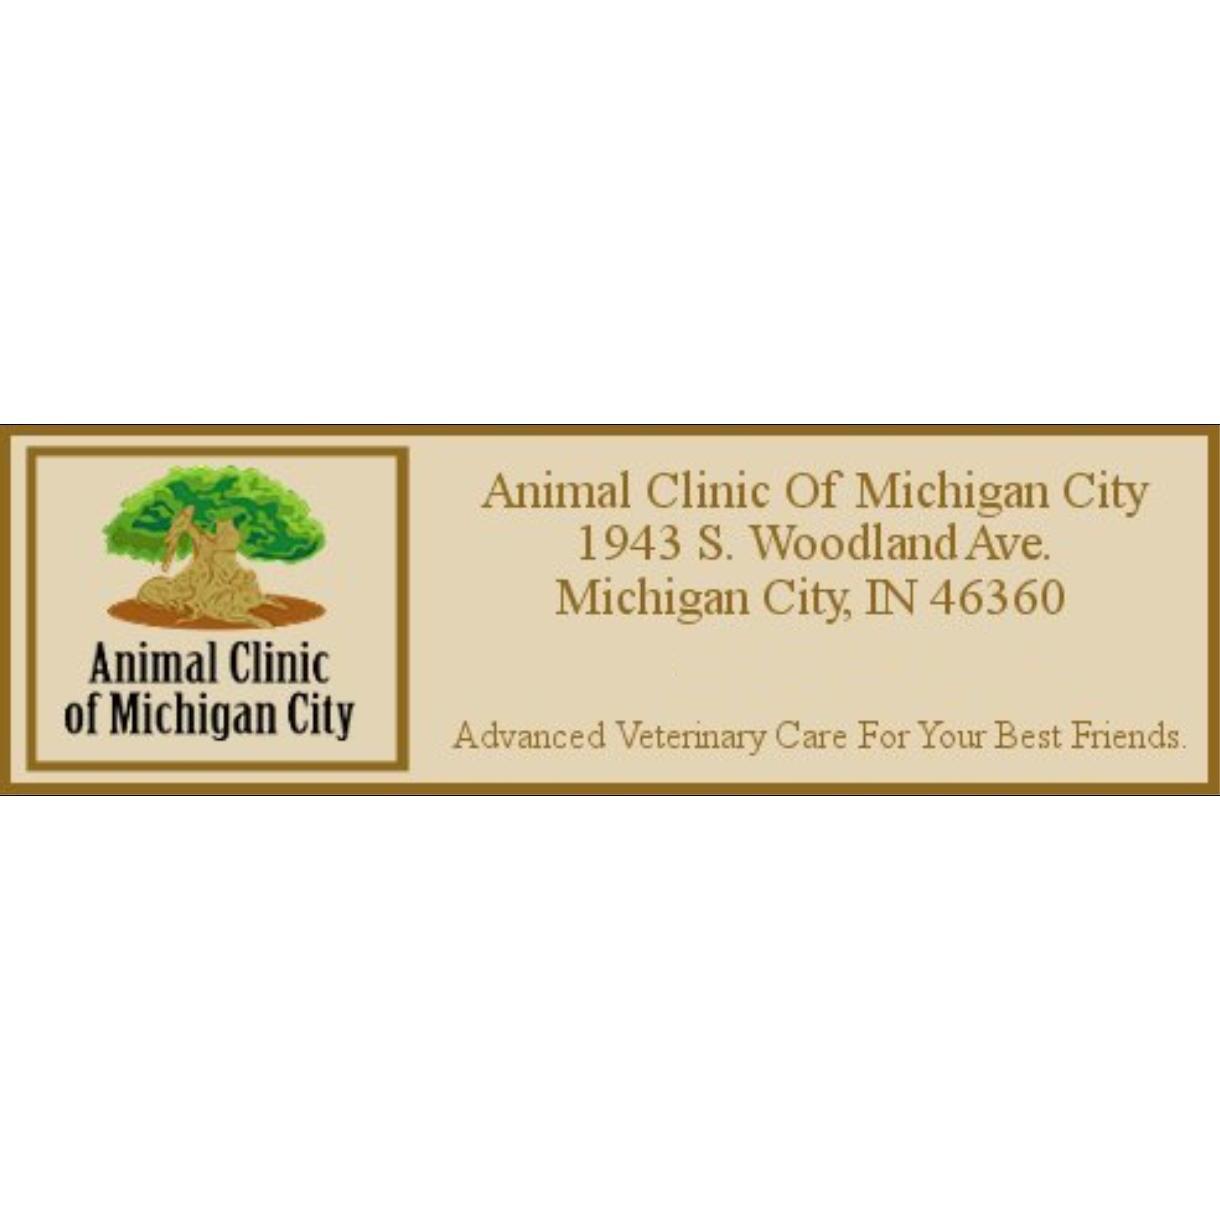 Animal Clinic Of Michigan City image 0